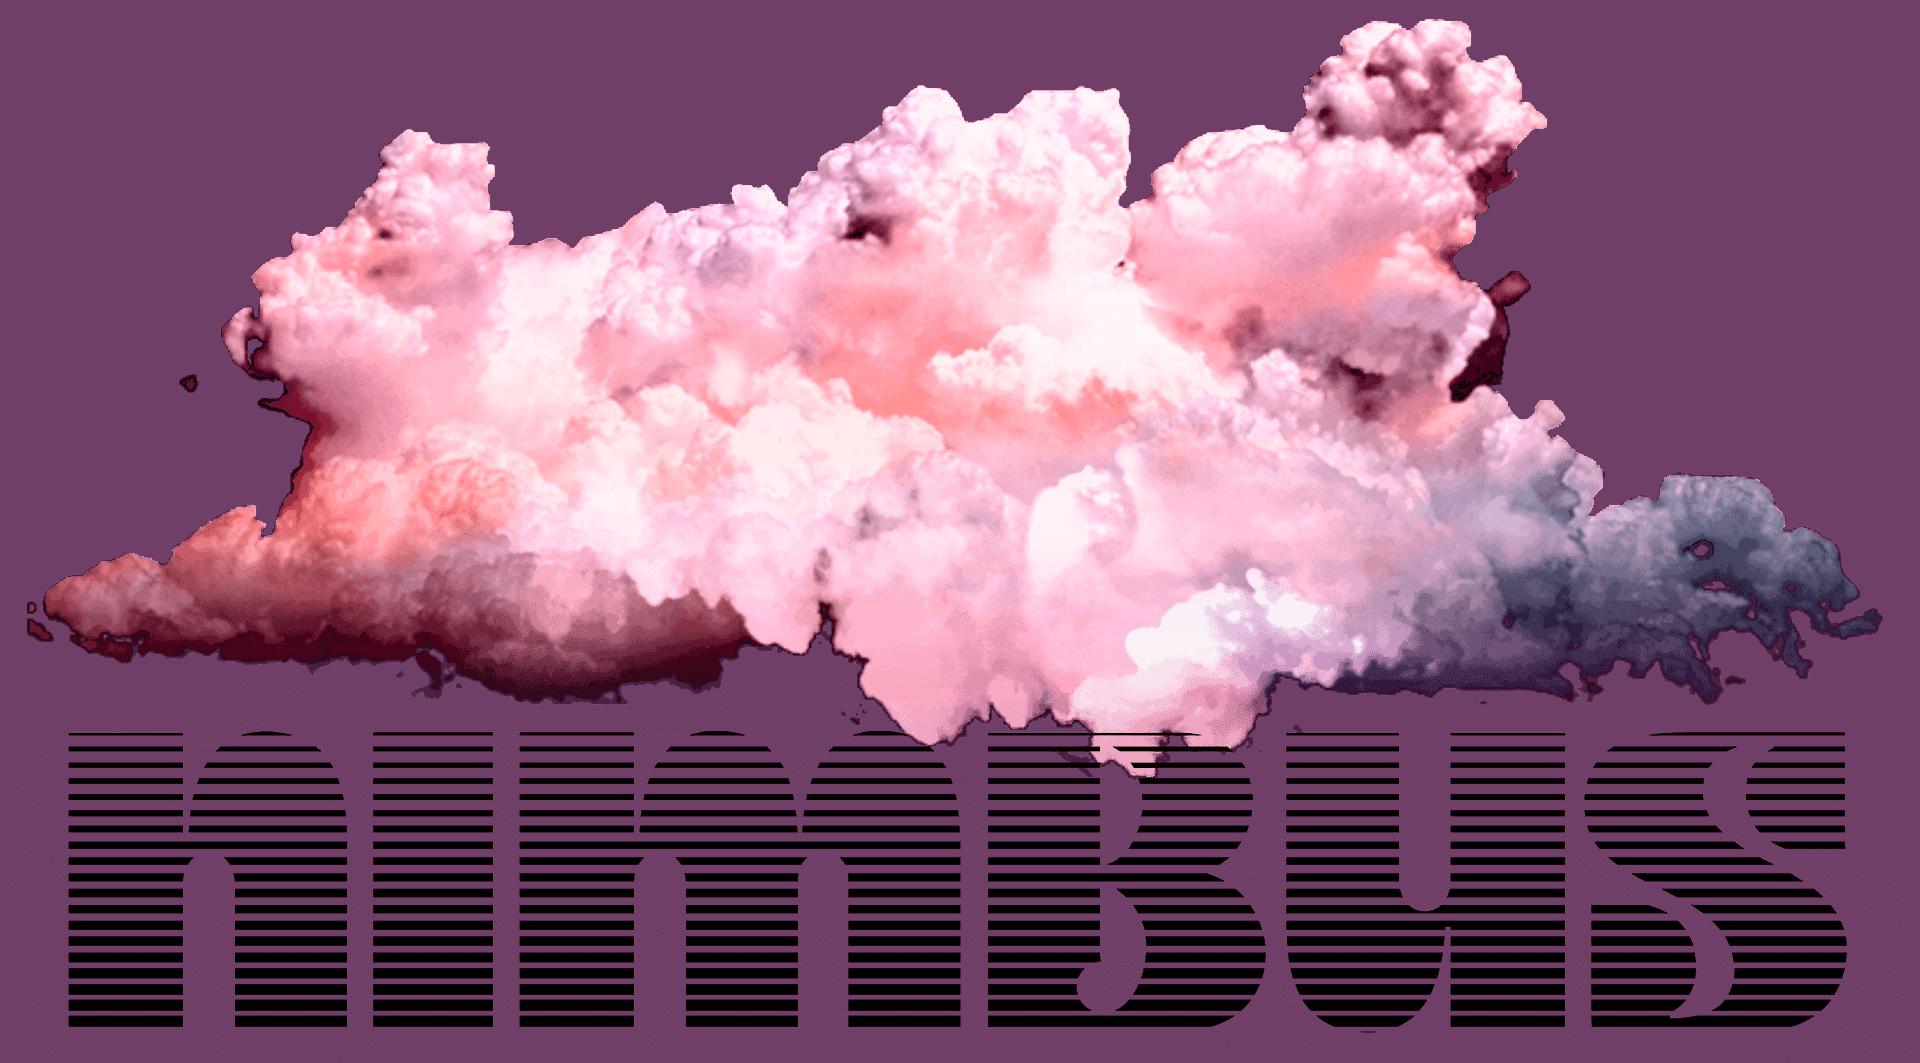 This is the Nimbus Media logo